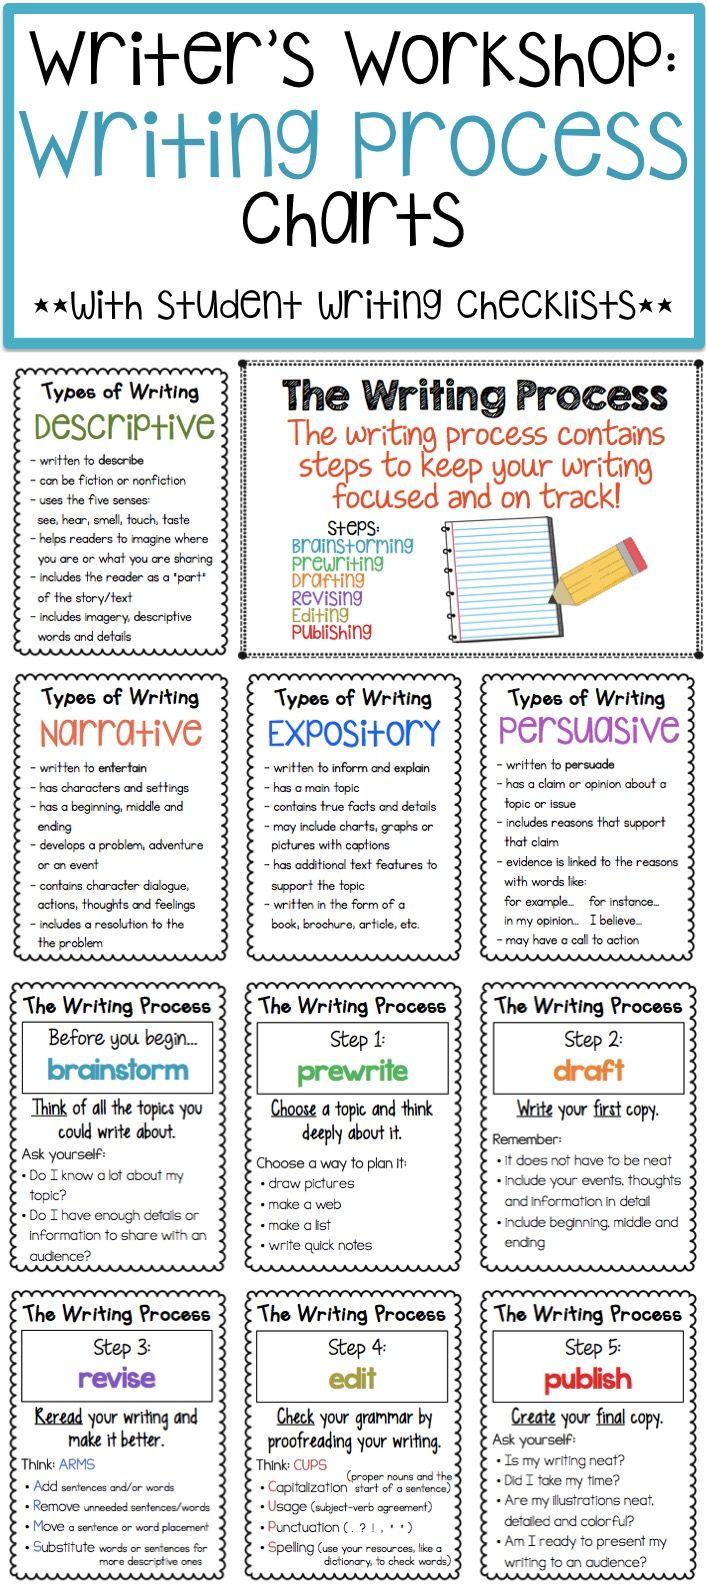 Writing Process Charts and Checklists | Writing process